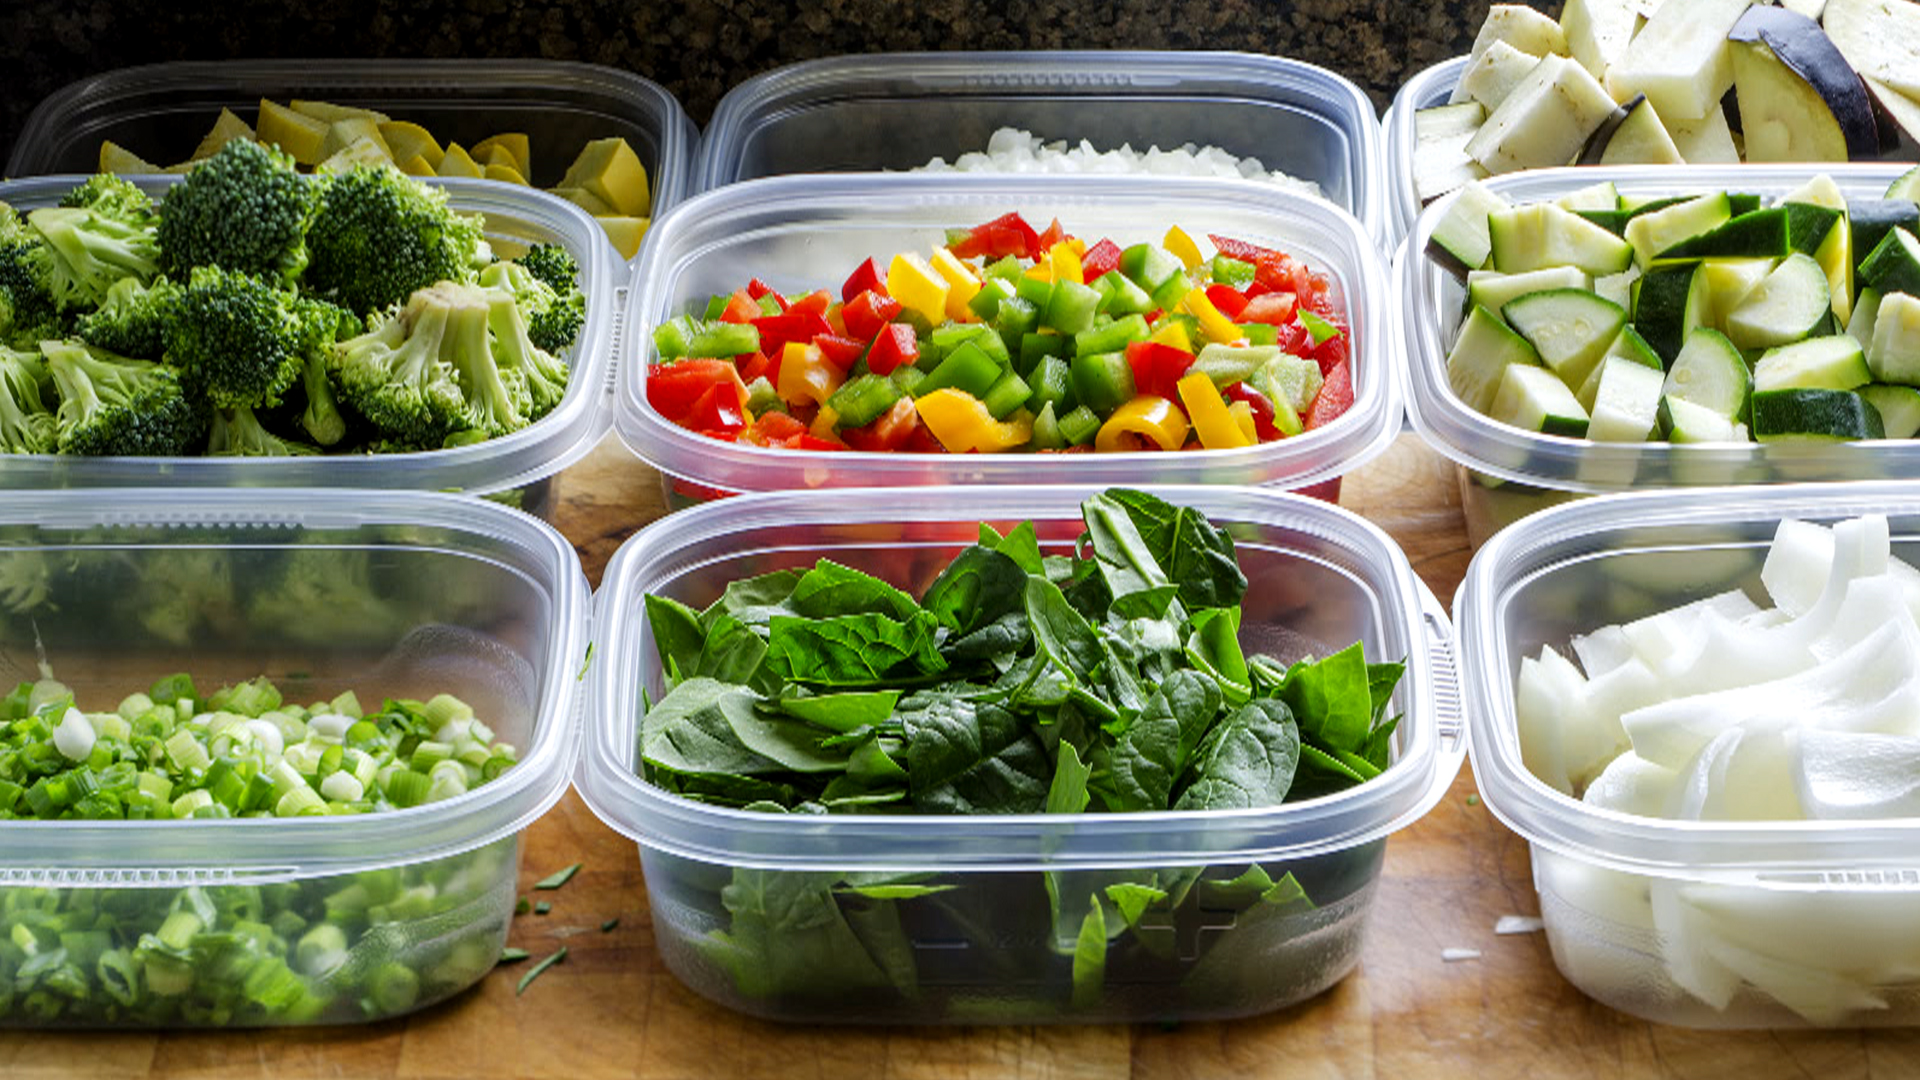 plastic-food-container-today-150809-tease_67690ea18e6fca498a674cb82e4854ab.jpg